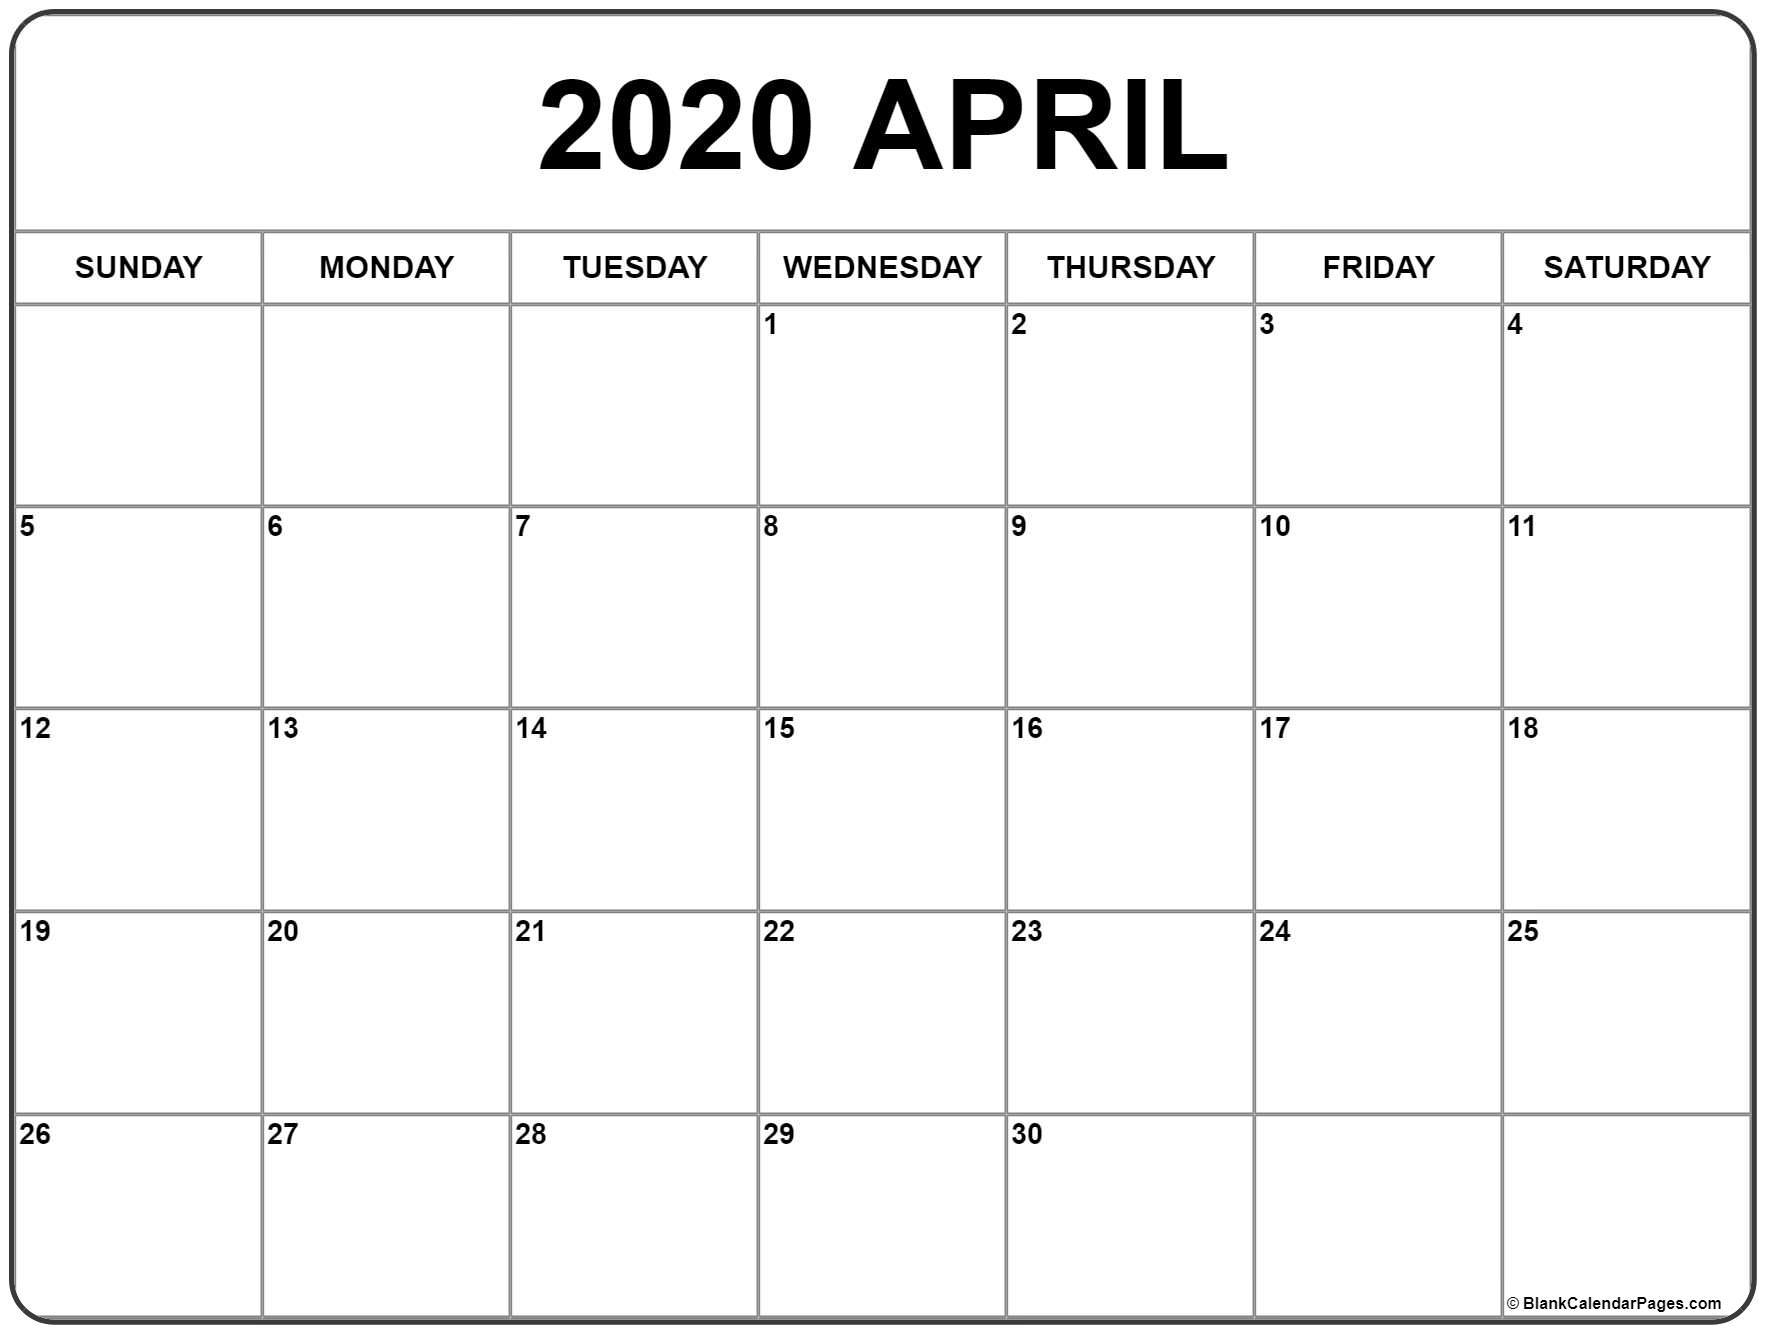 April 2020 Calendar | Free Printable Monthly Calendars